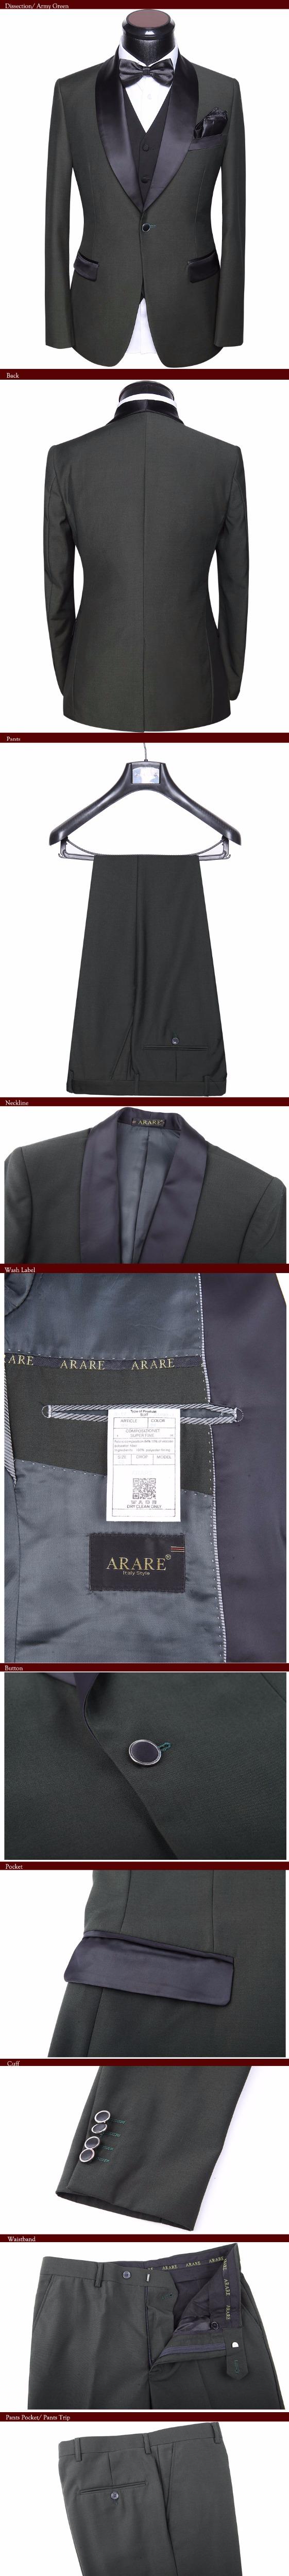 HTB18VBwaQfb uJkSnaVq6xFmVXa2 - Men Wedding Dress Suits 2017 Latest 5 piece Groom Wedding Suit Set Slim Fit Round Collar Prom Party Black-tie Dress